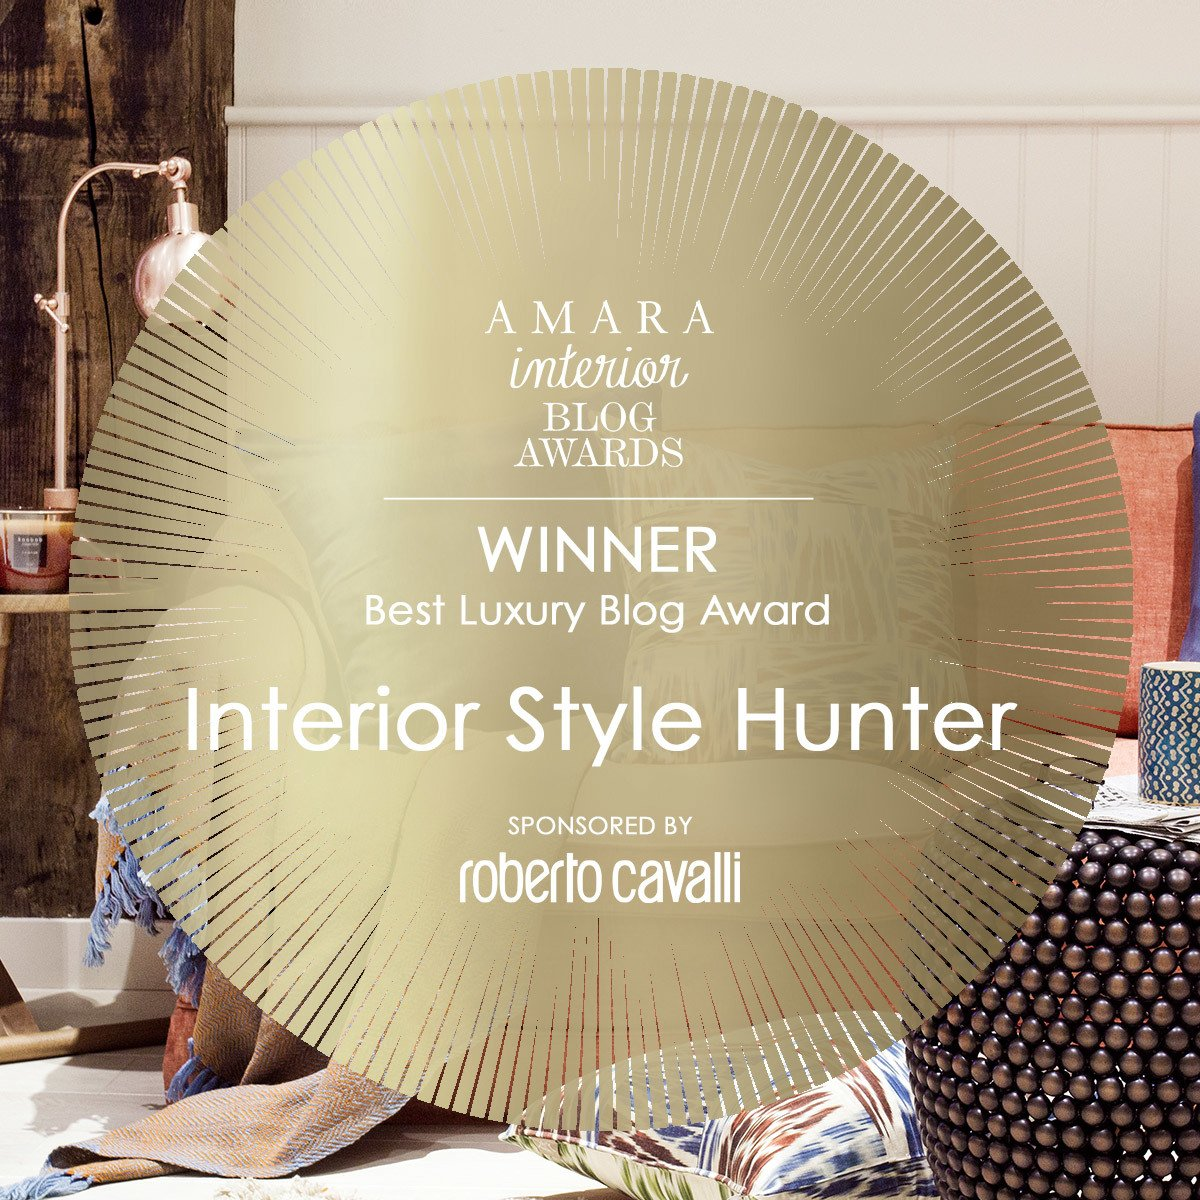 Amara Interior Blog Awards Interior Style Hunter